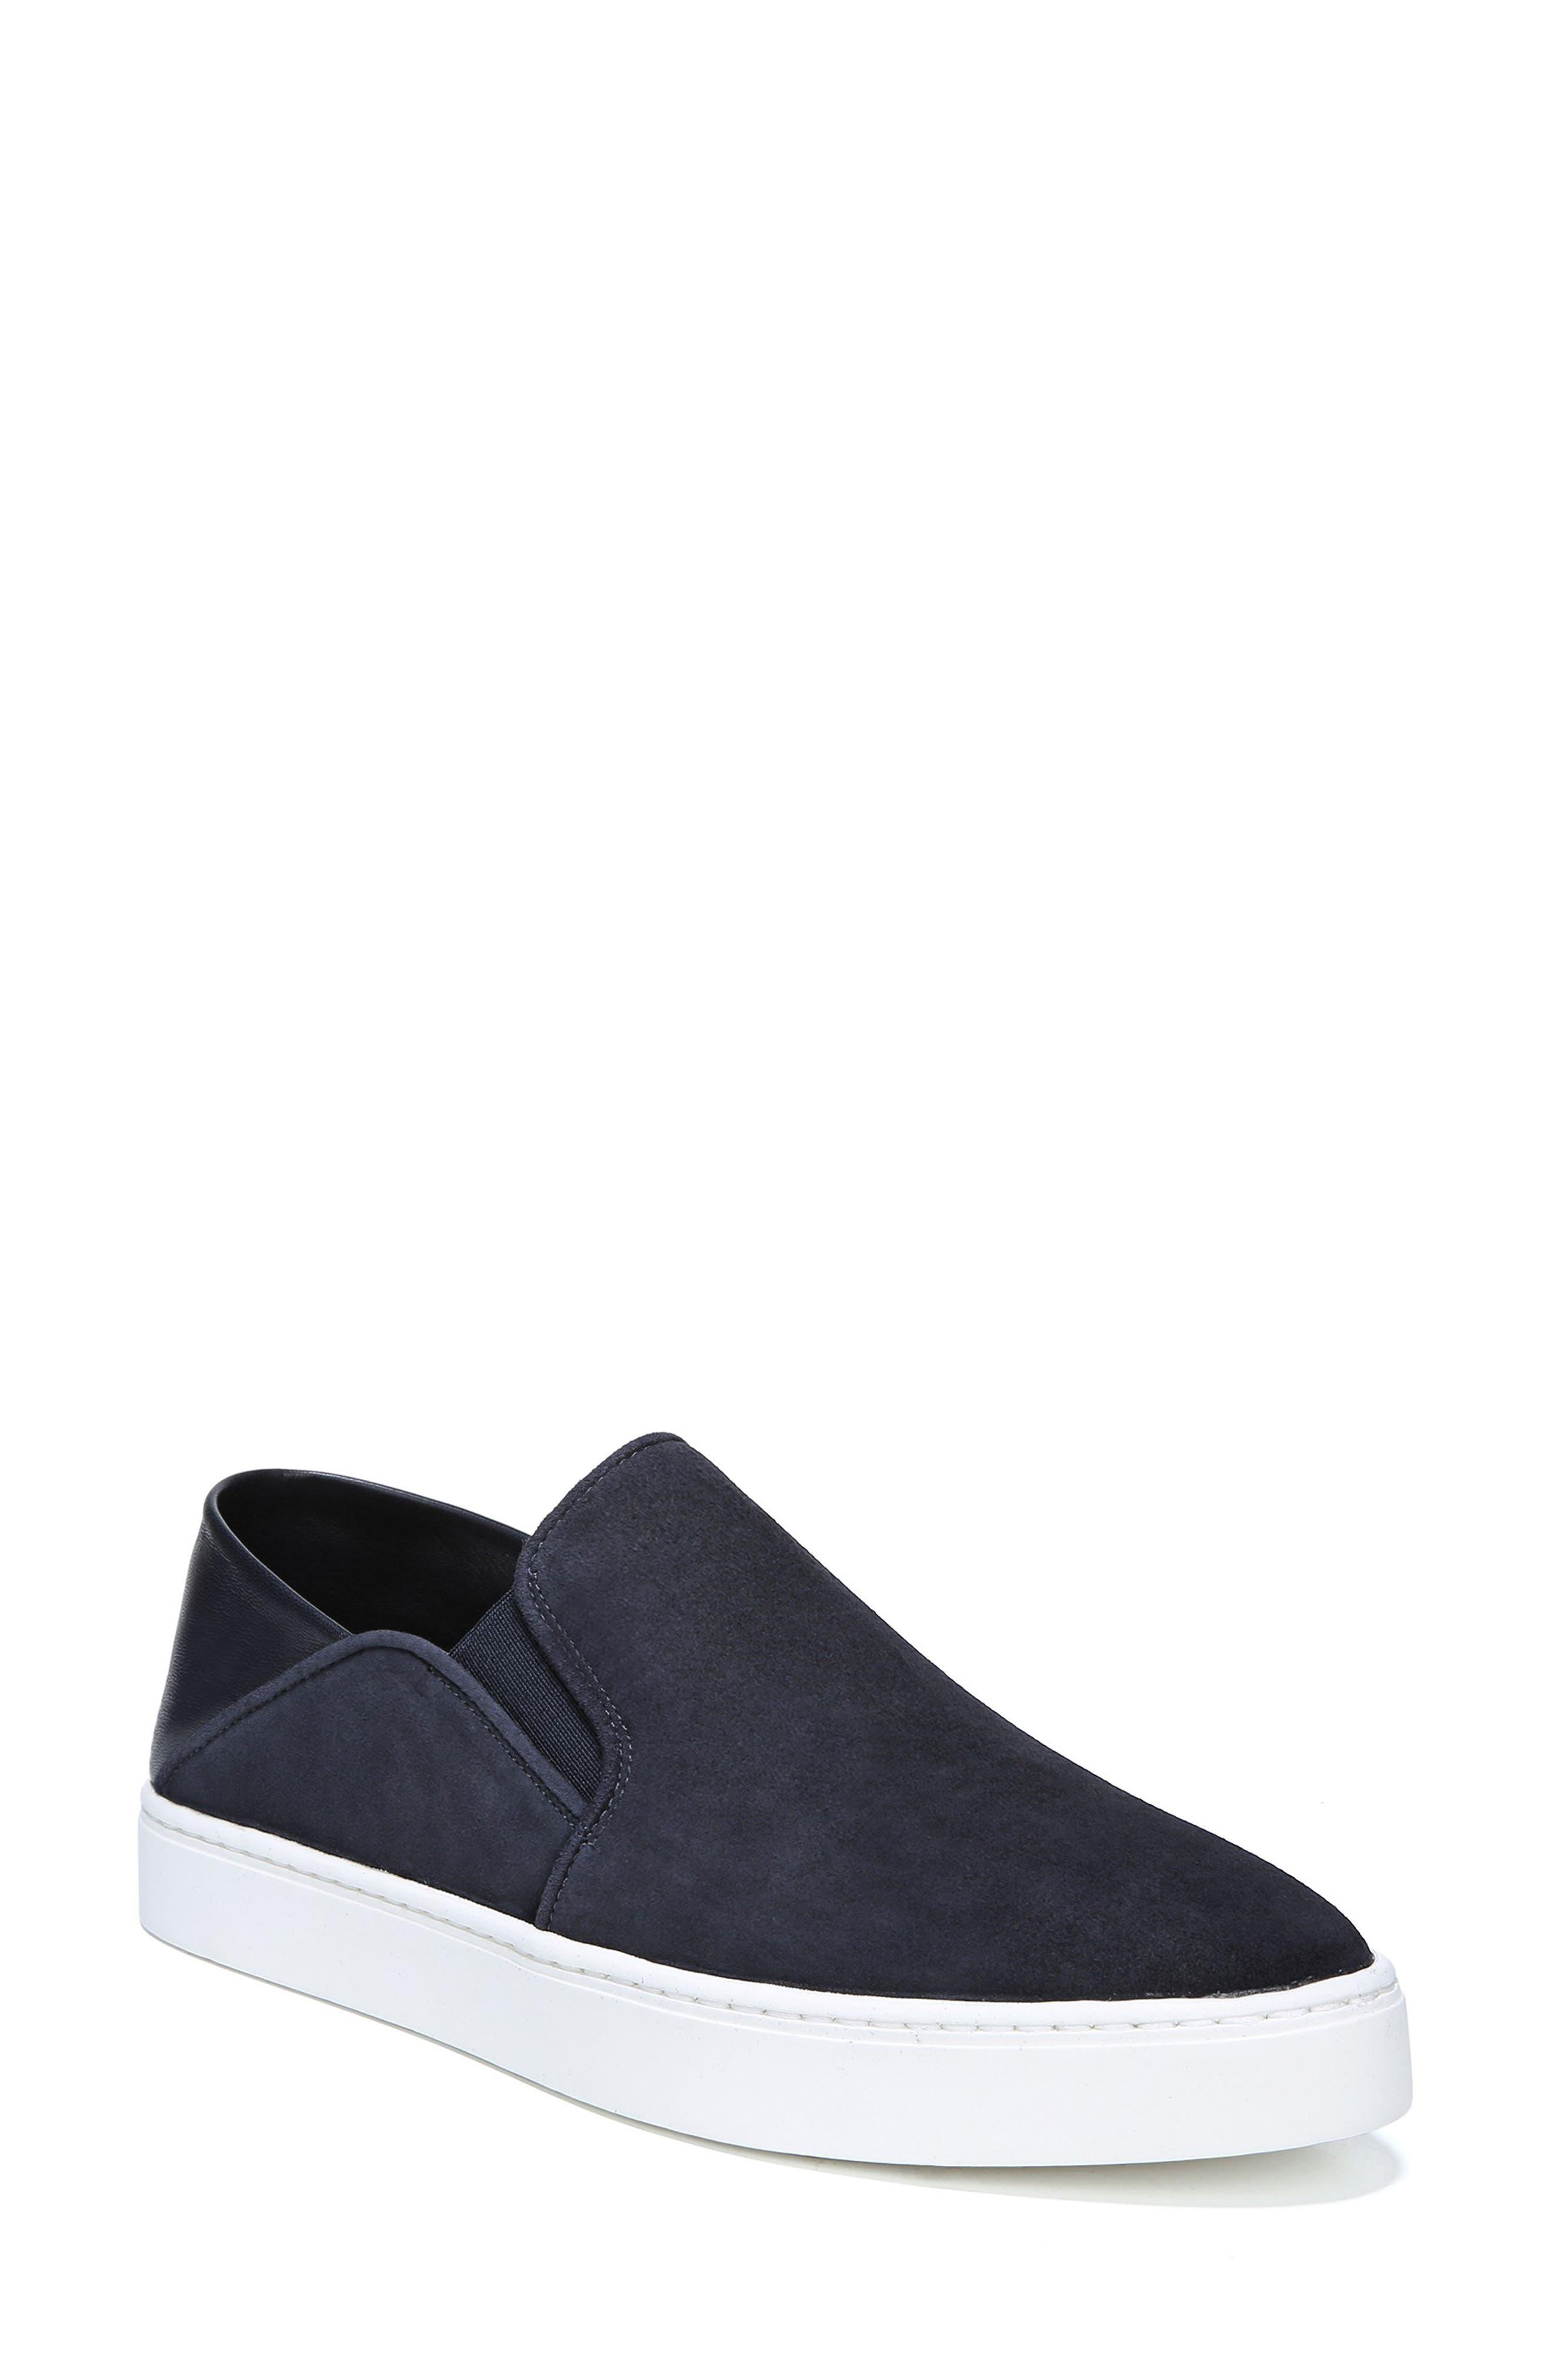 VINCE, Garvey Slip-On Sneaker, Main thumbnail 1, color, COASTAL